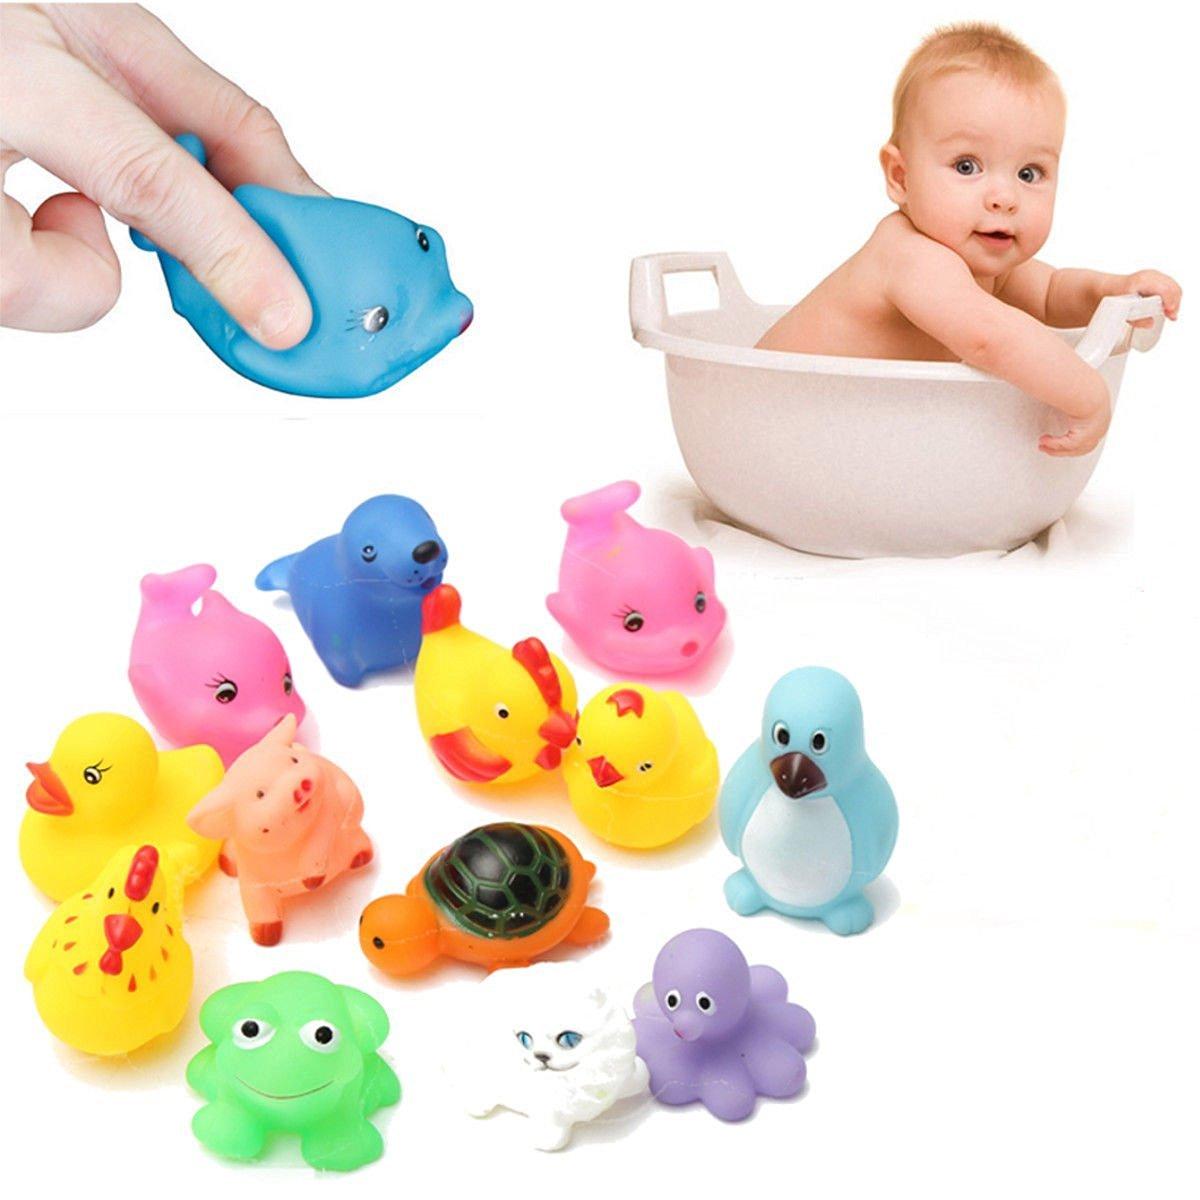 Buy 13Pcs Cute Animals Baby Kids Bath Soft Rubber Float Sqeeze Sound ...